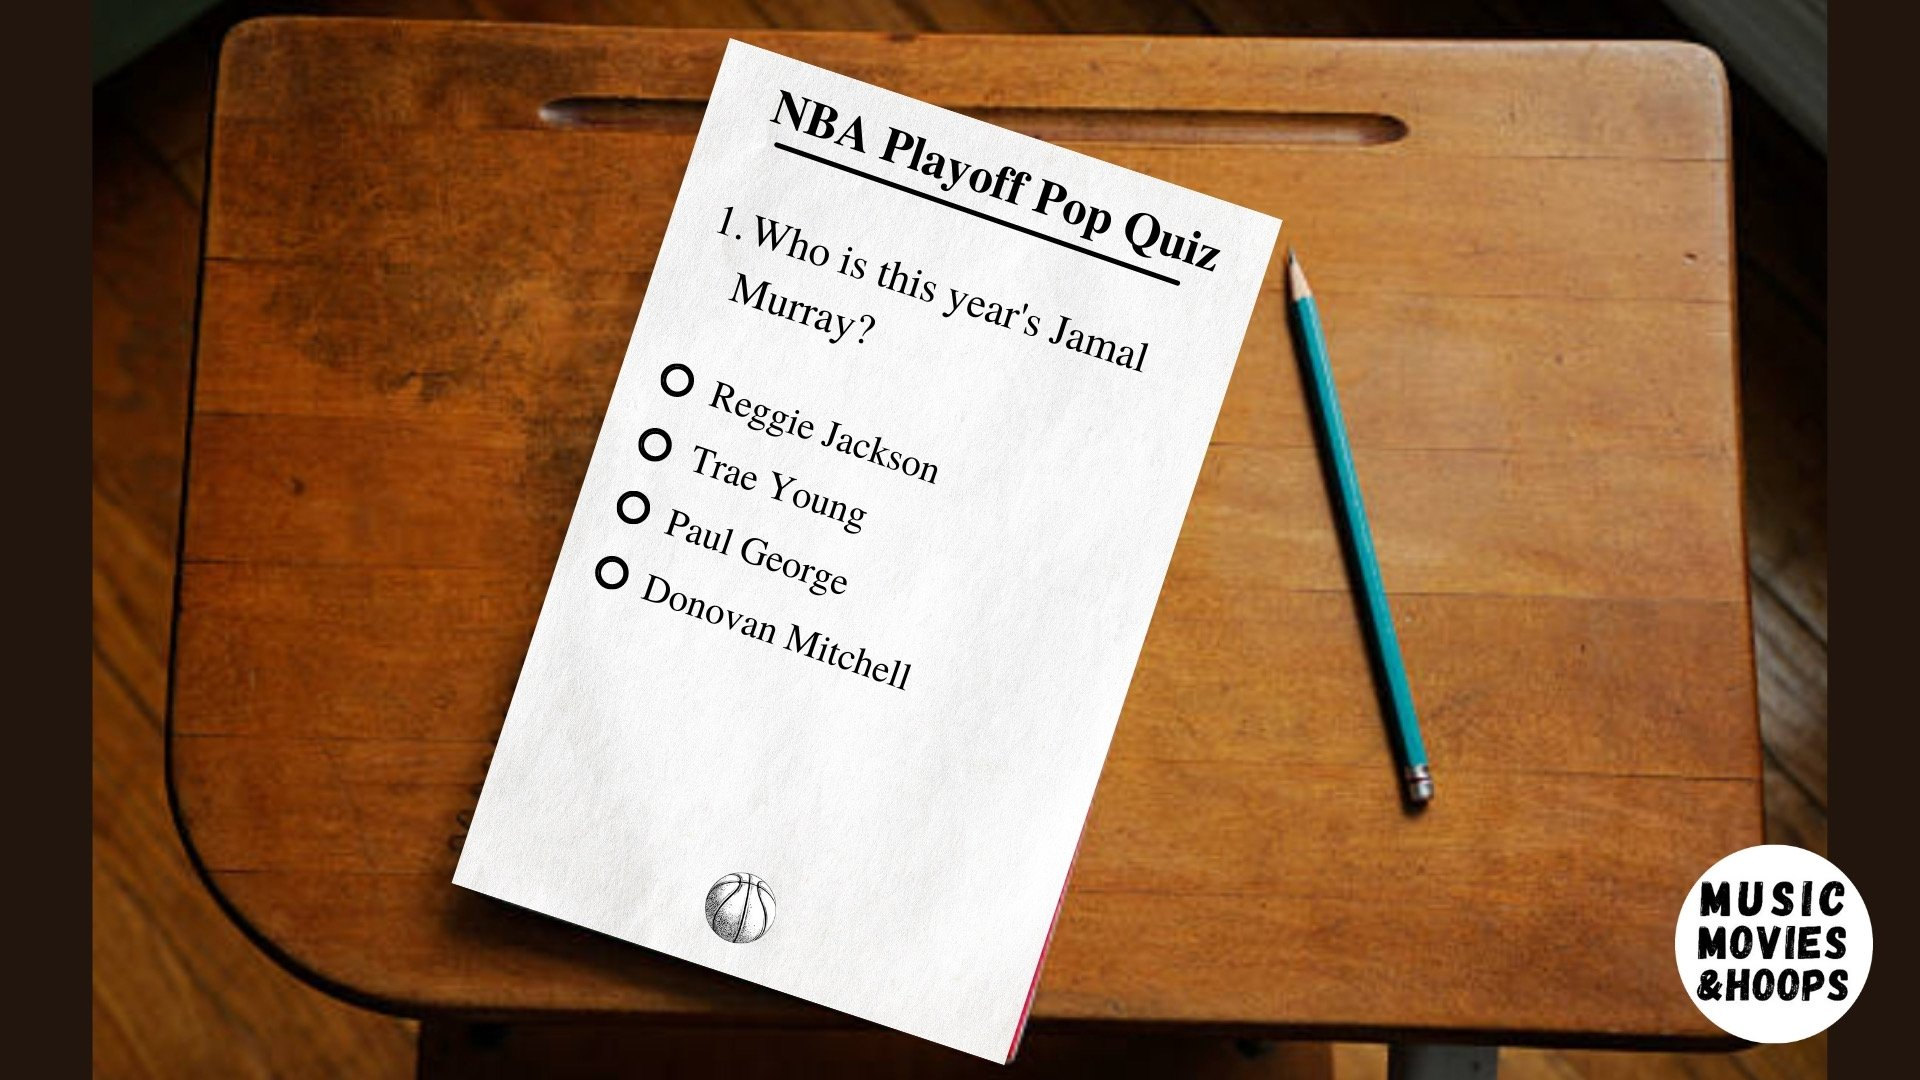 NBA Playoff Pop Quiz!